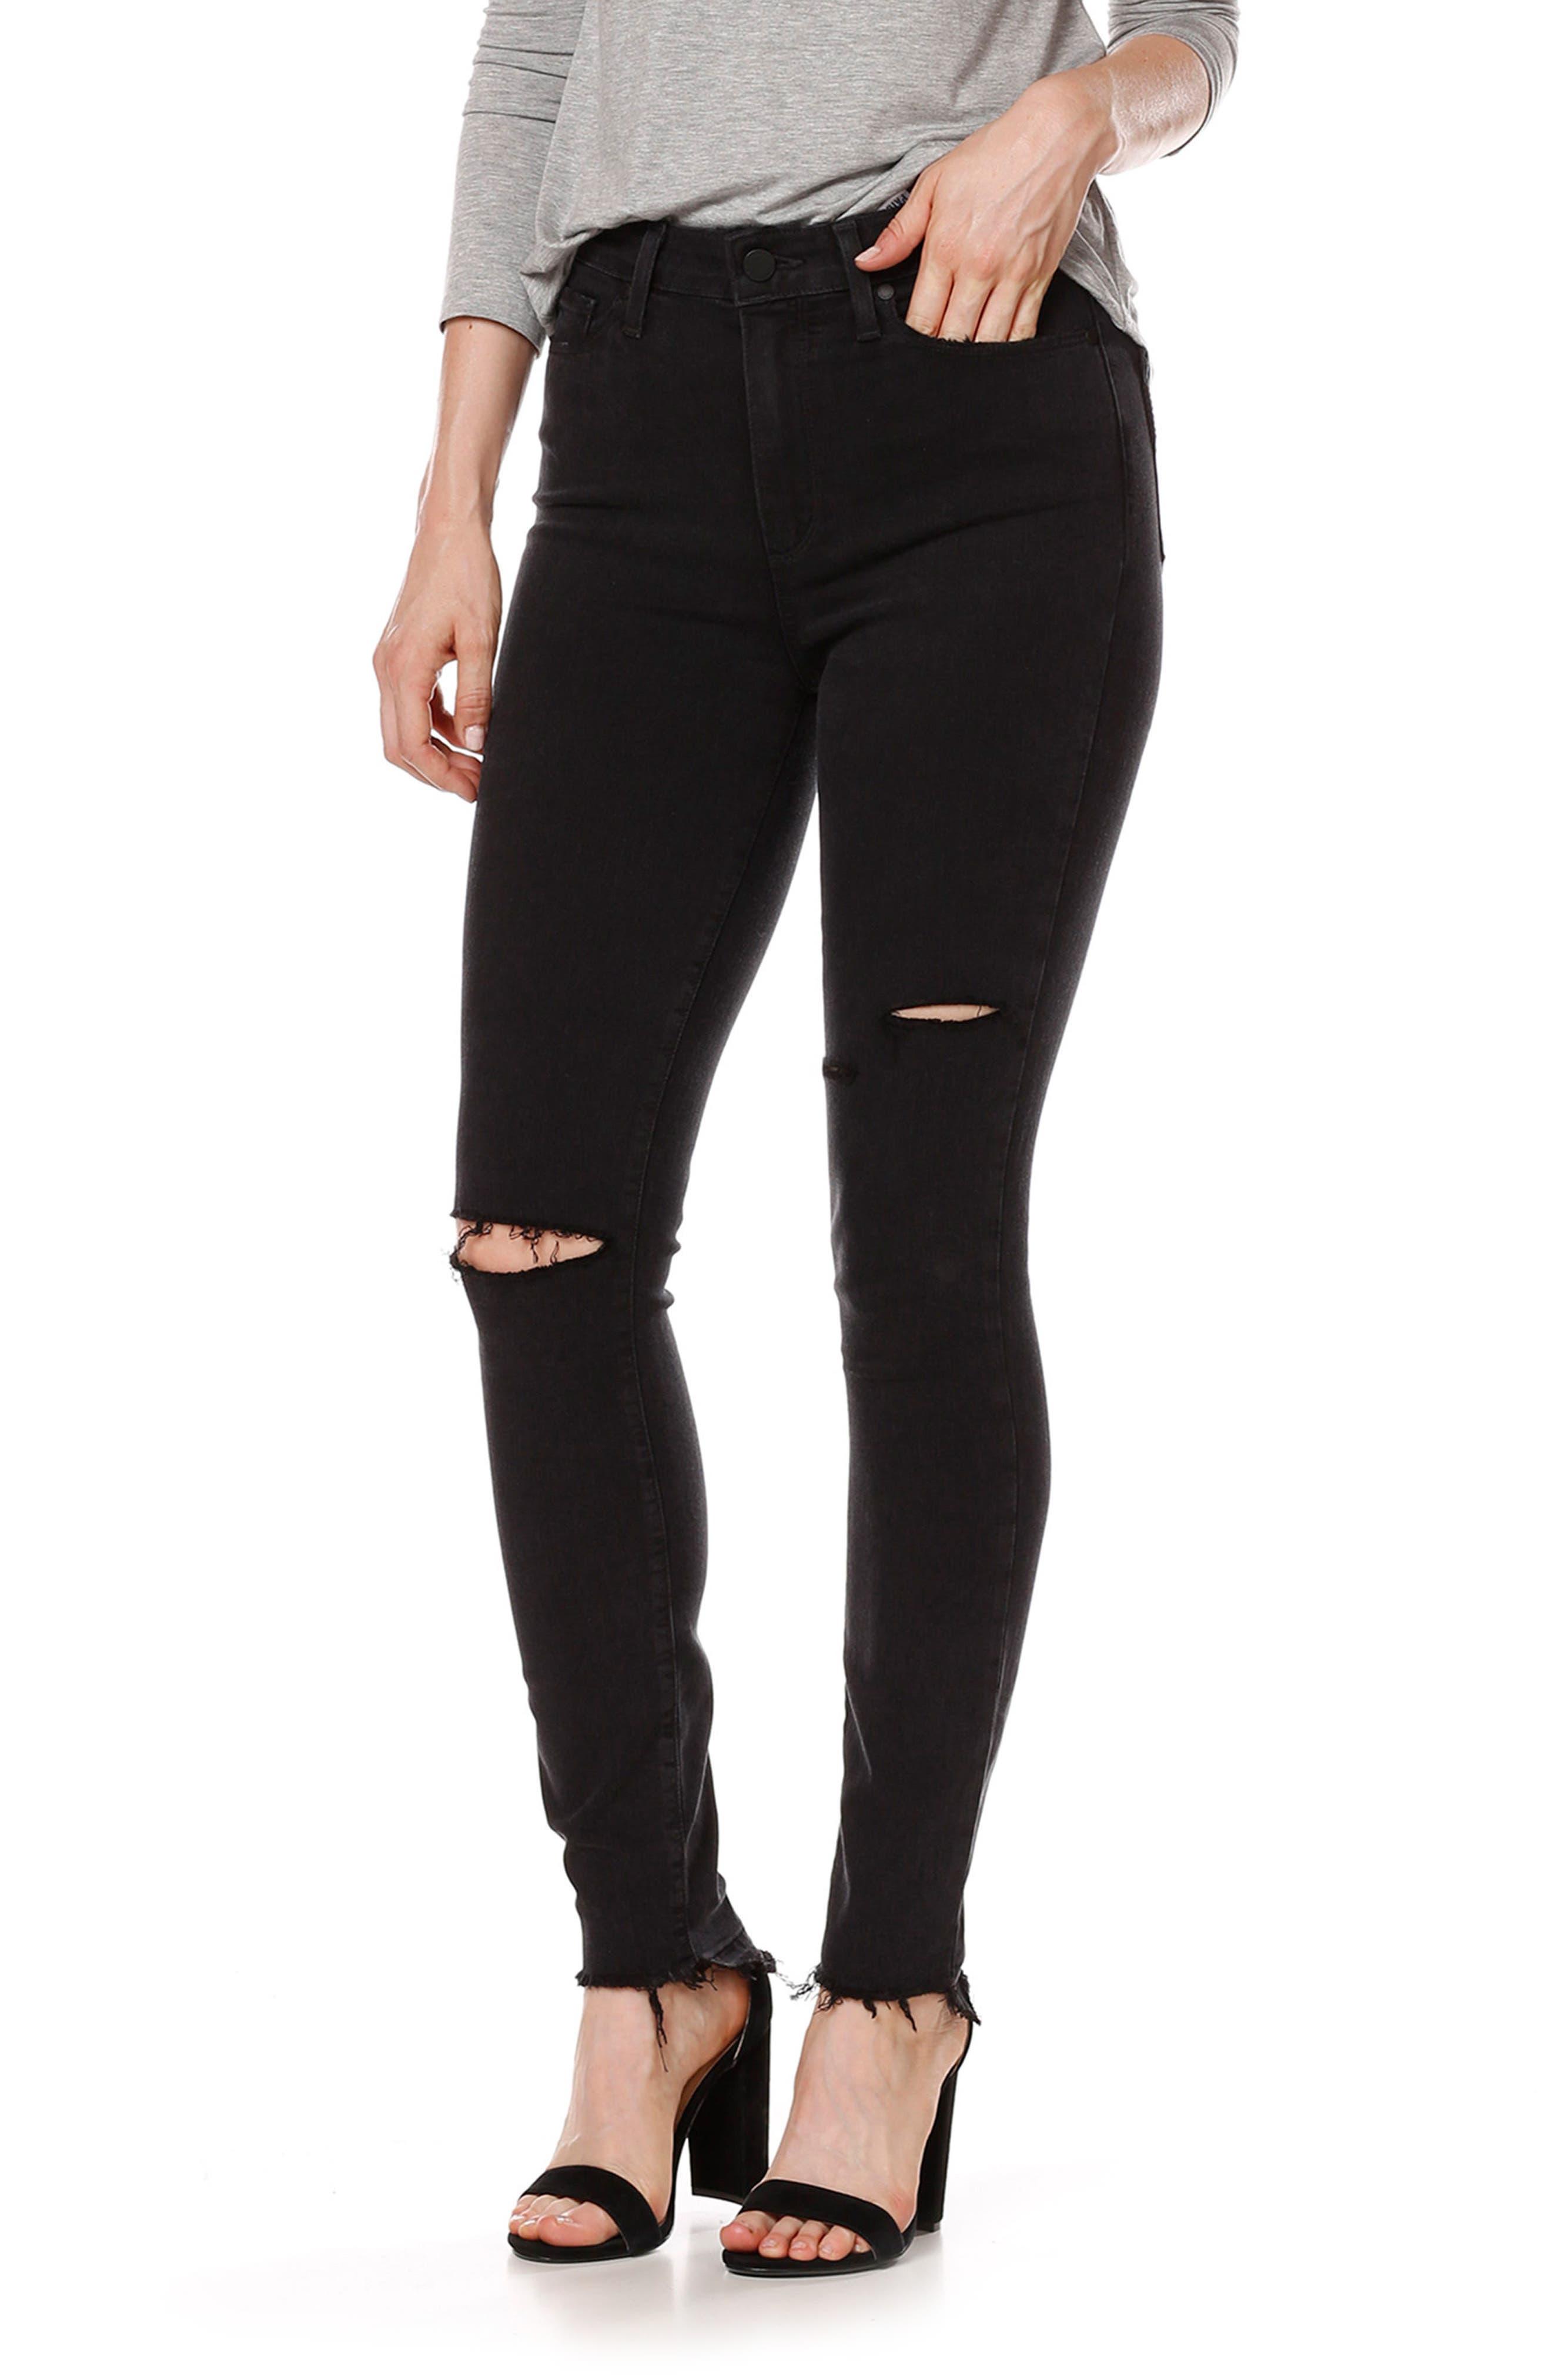 Transcend - Margot High Waist Ankle Skinny Jeans,                             Main thumbnail 1, color,                             001